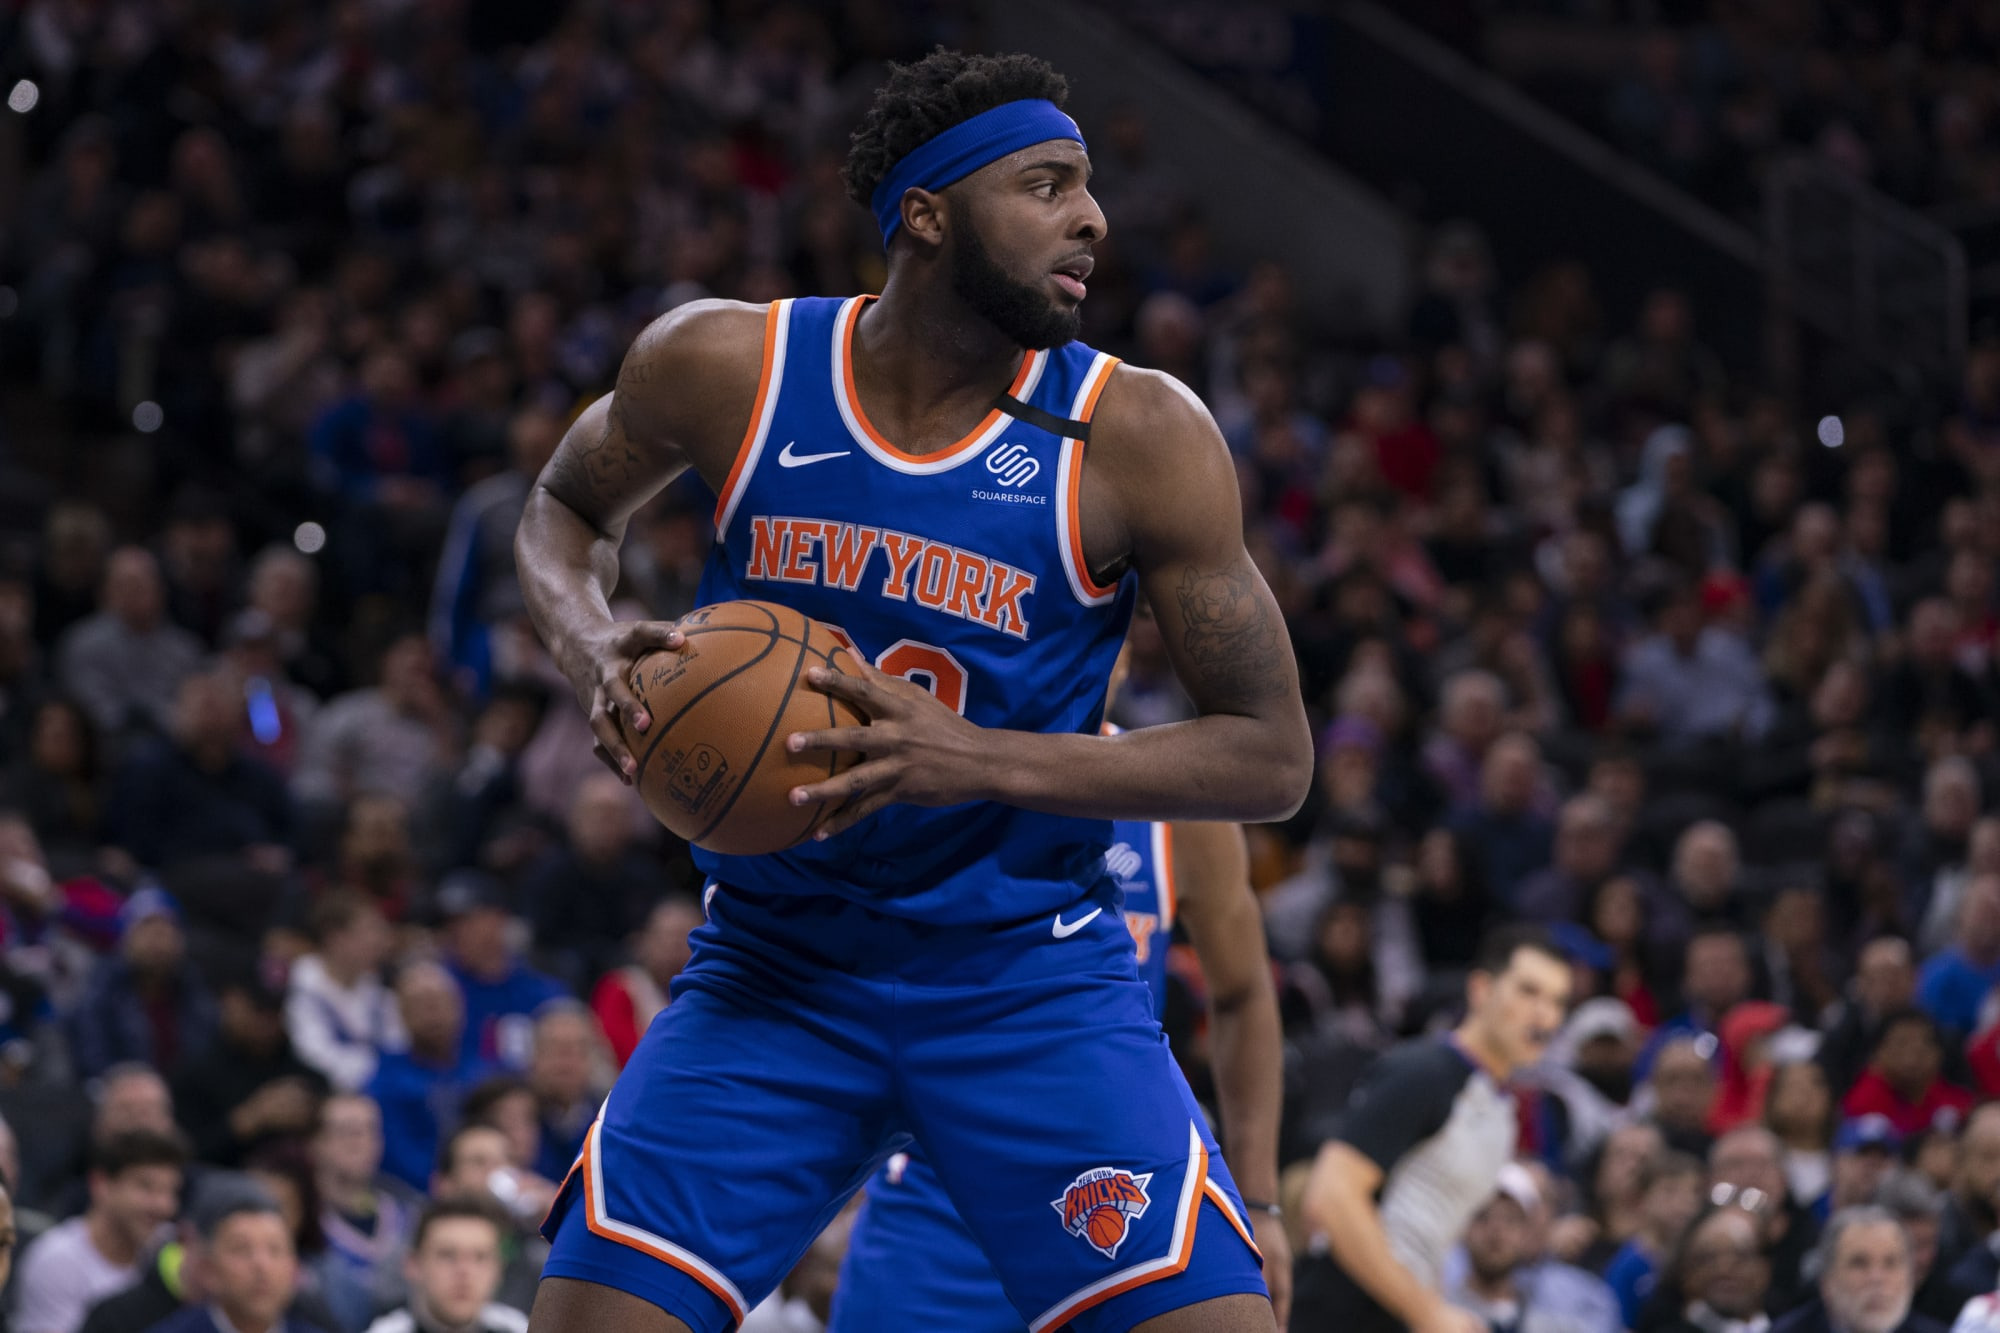 Toronto Raptors: 2020 NBA Draft trade for Mitchell Robinson